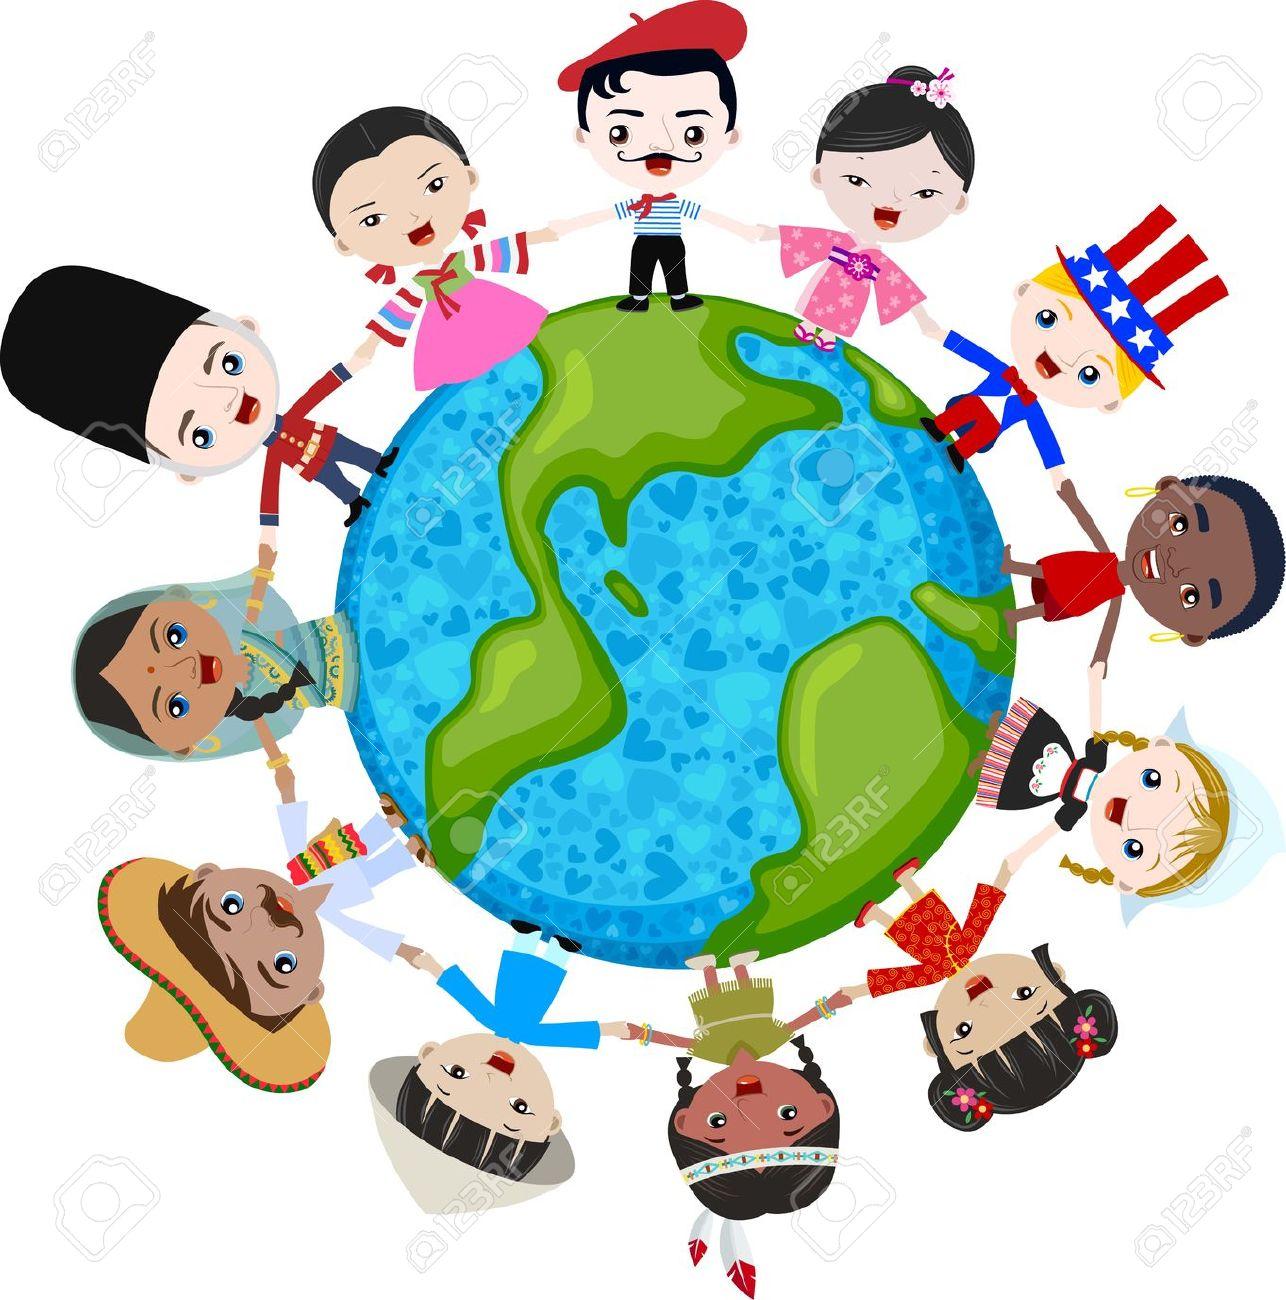 Culture clipart cultural diversity Copy1 emaze Museum on Cultural